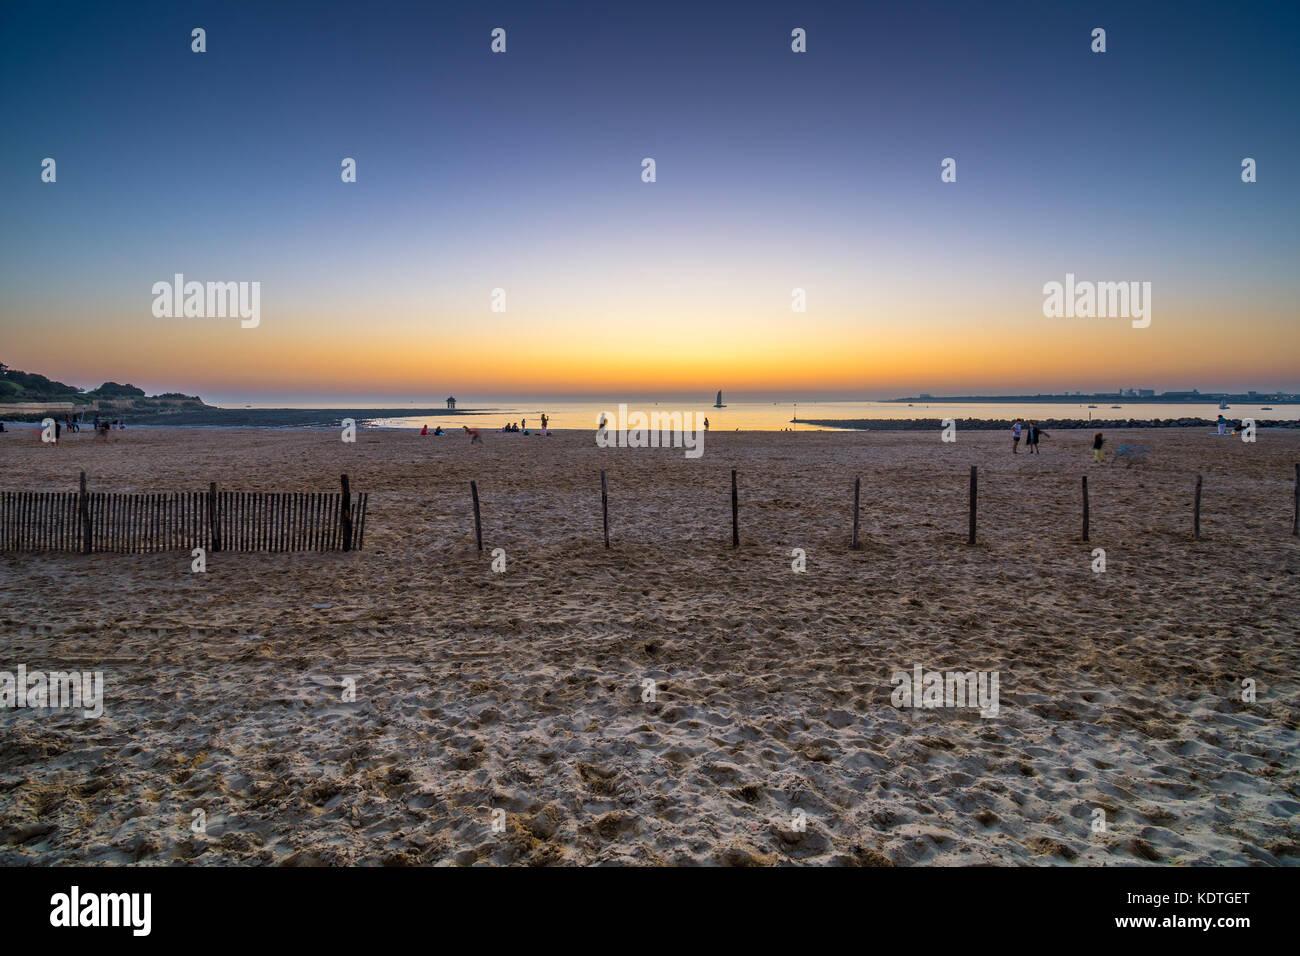 Sunset across the beach, Les Miinnimes, La Rochelle, France. - Stock Image